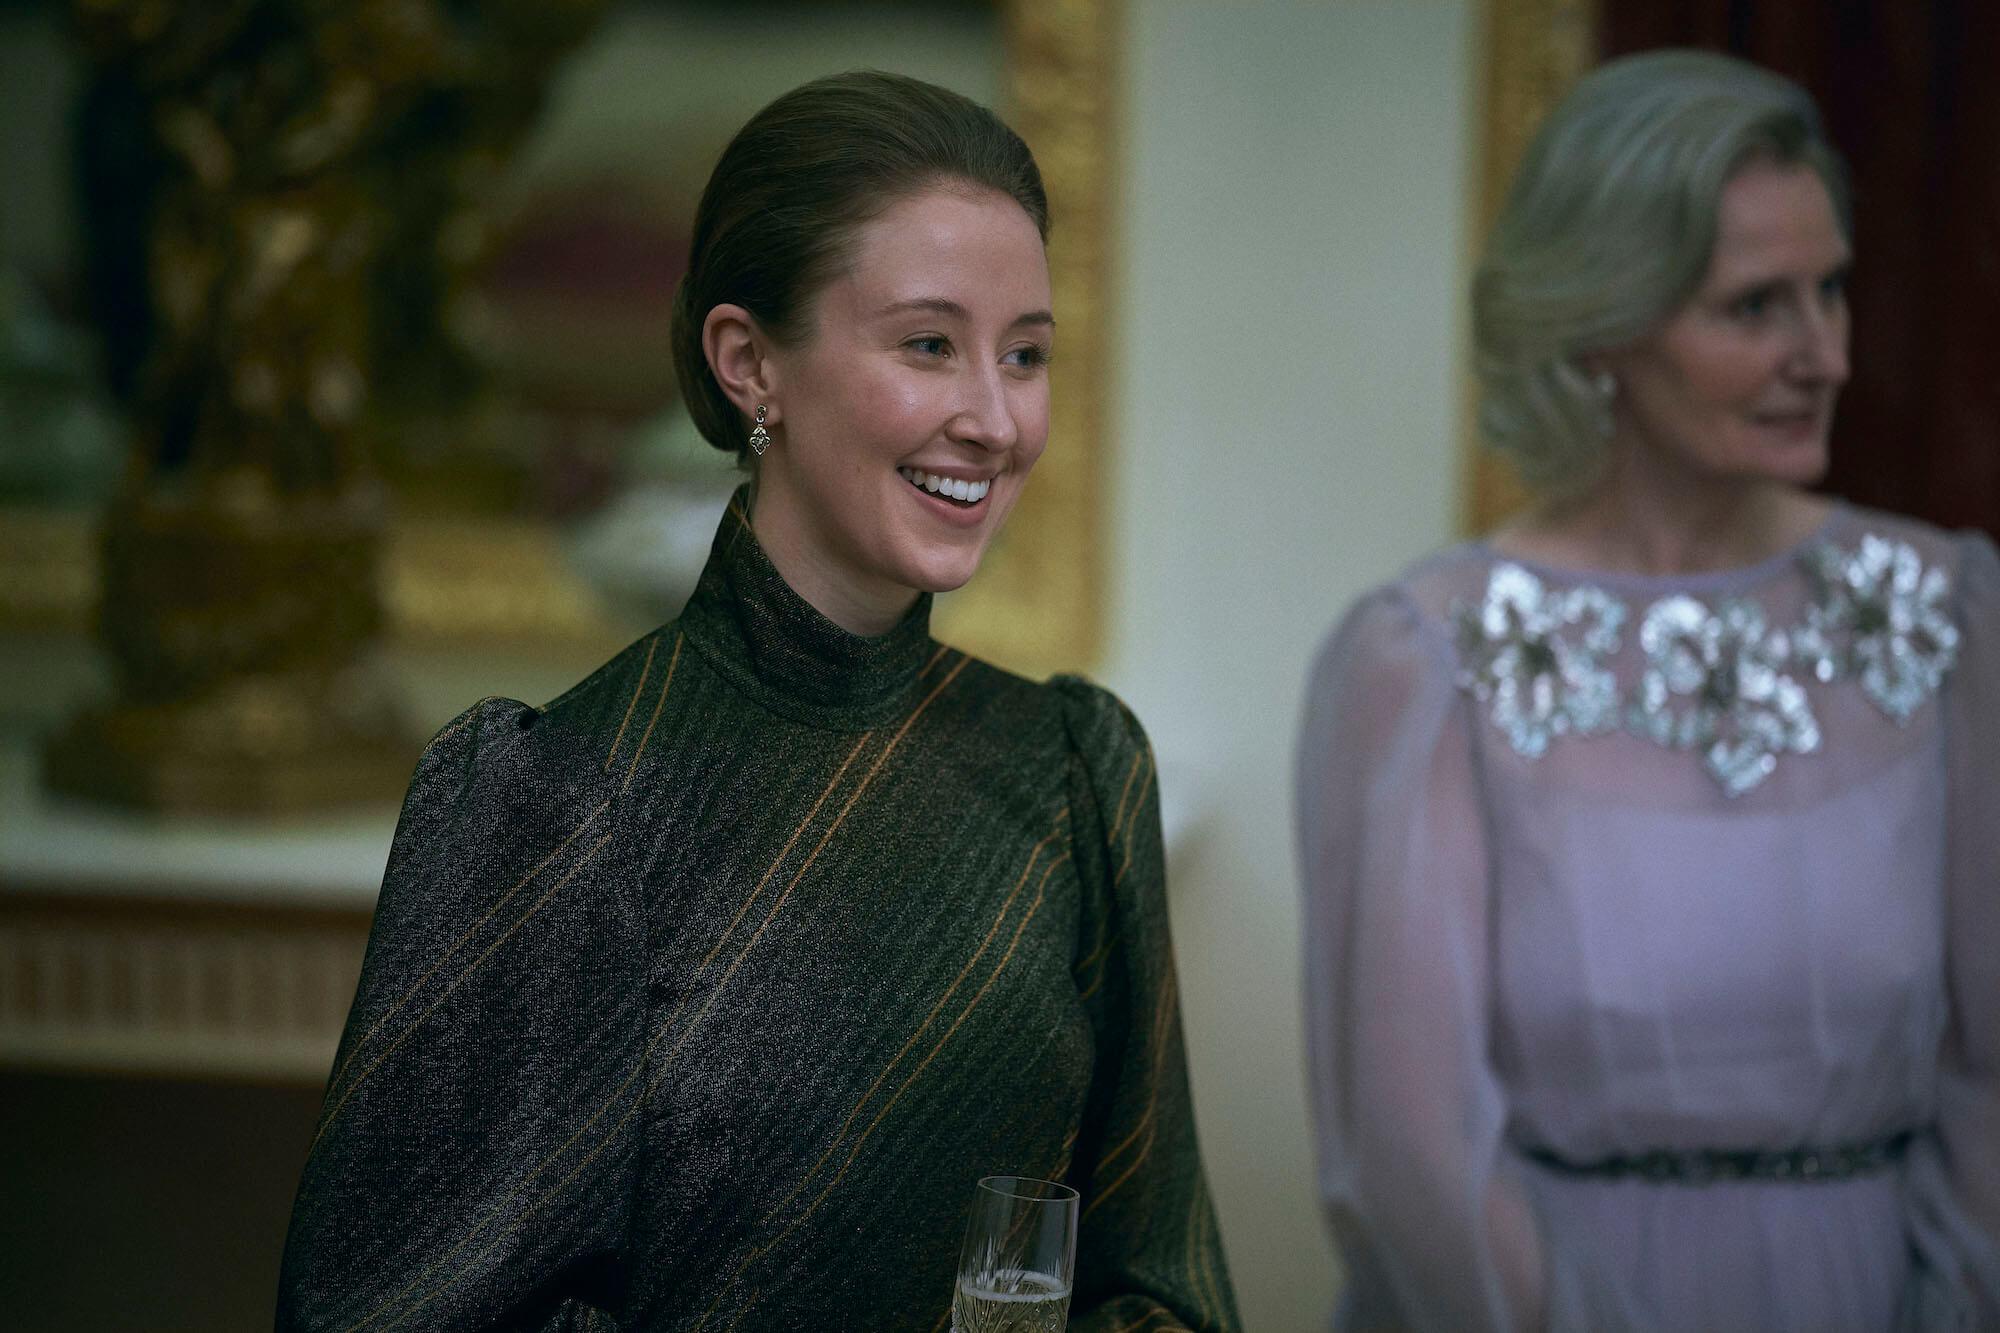 Erin Doherty as Princess Anne in The Crown season 4